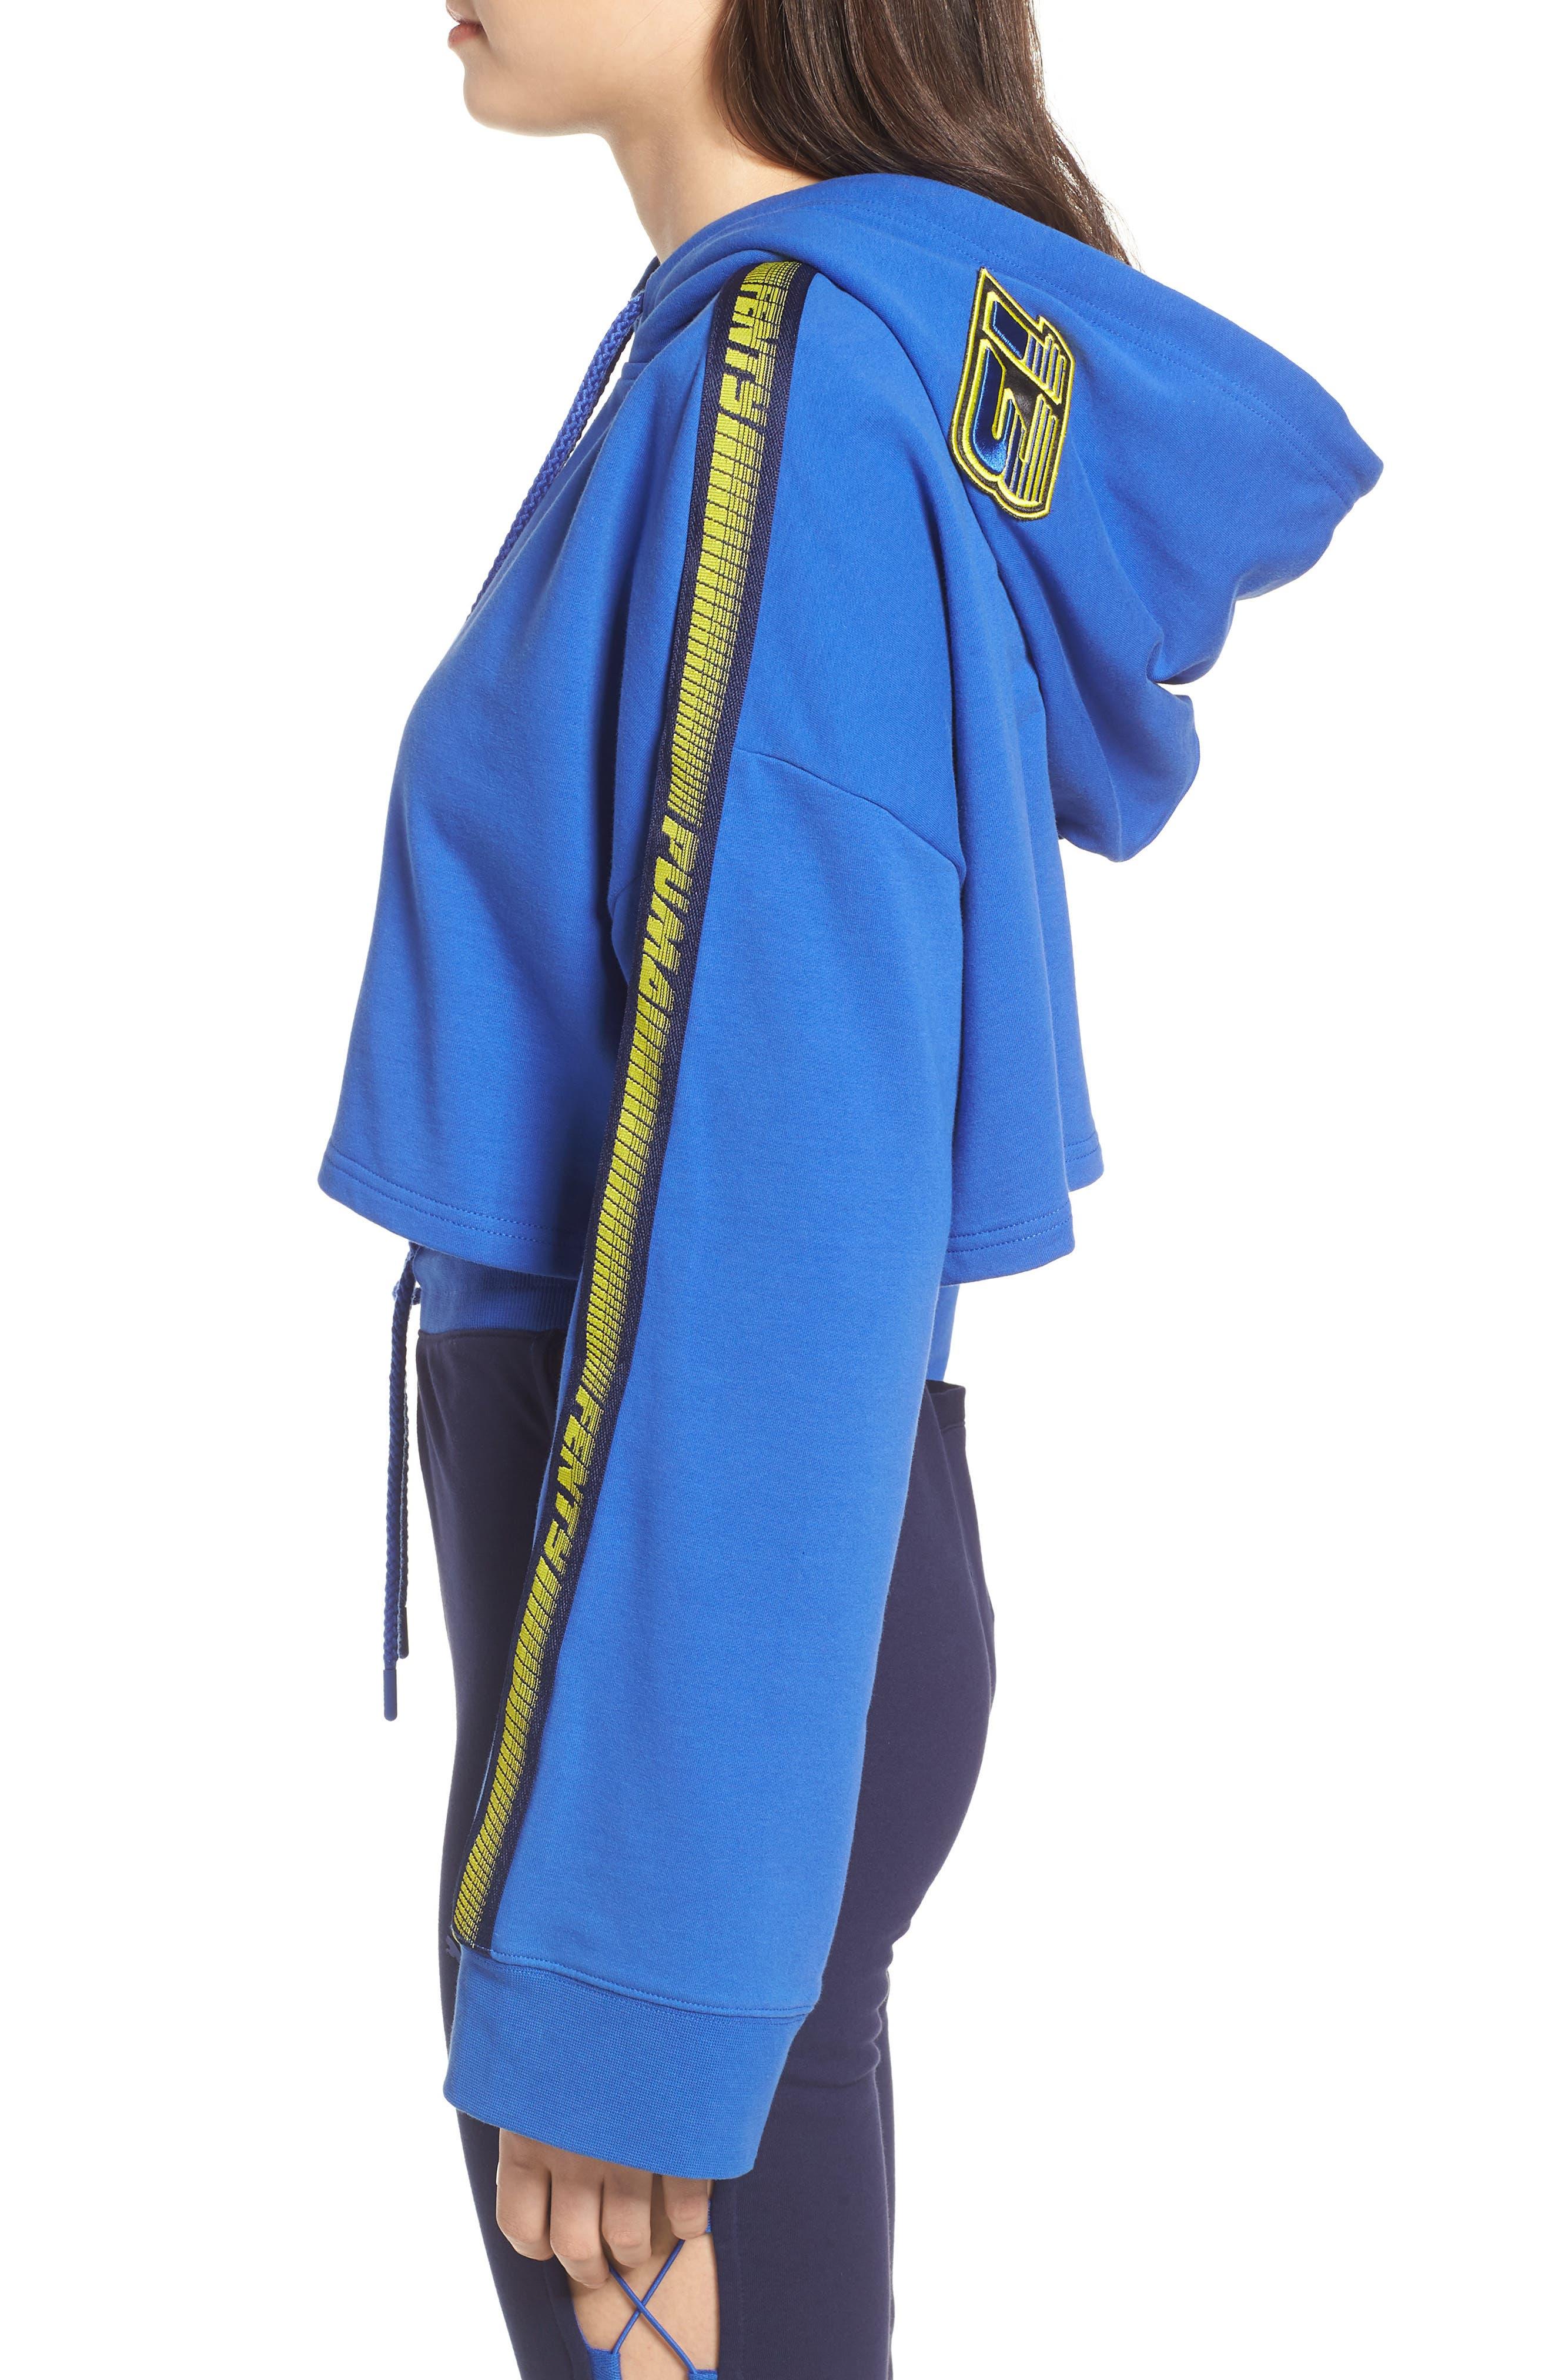 FENTY PUMA by Rihanna Hooded Crop Sweatshirt,                             Alternate thumbnail 3, color,                             Dazzling Blue